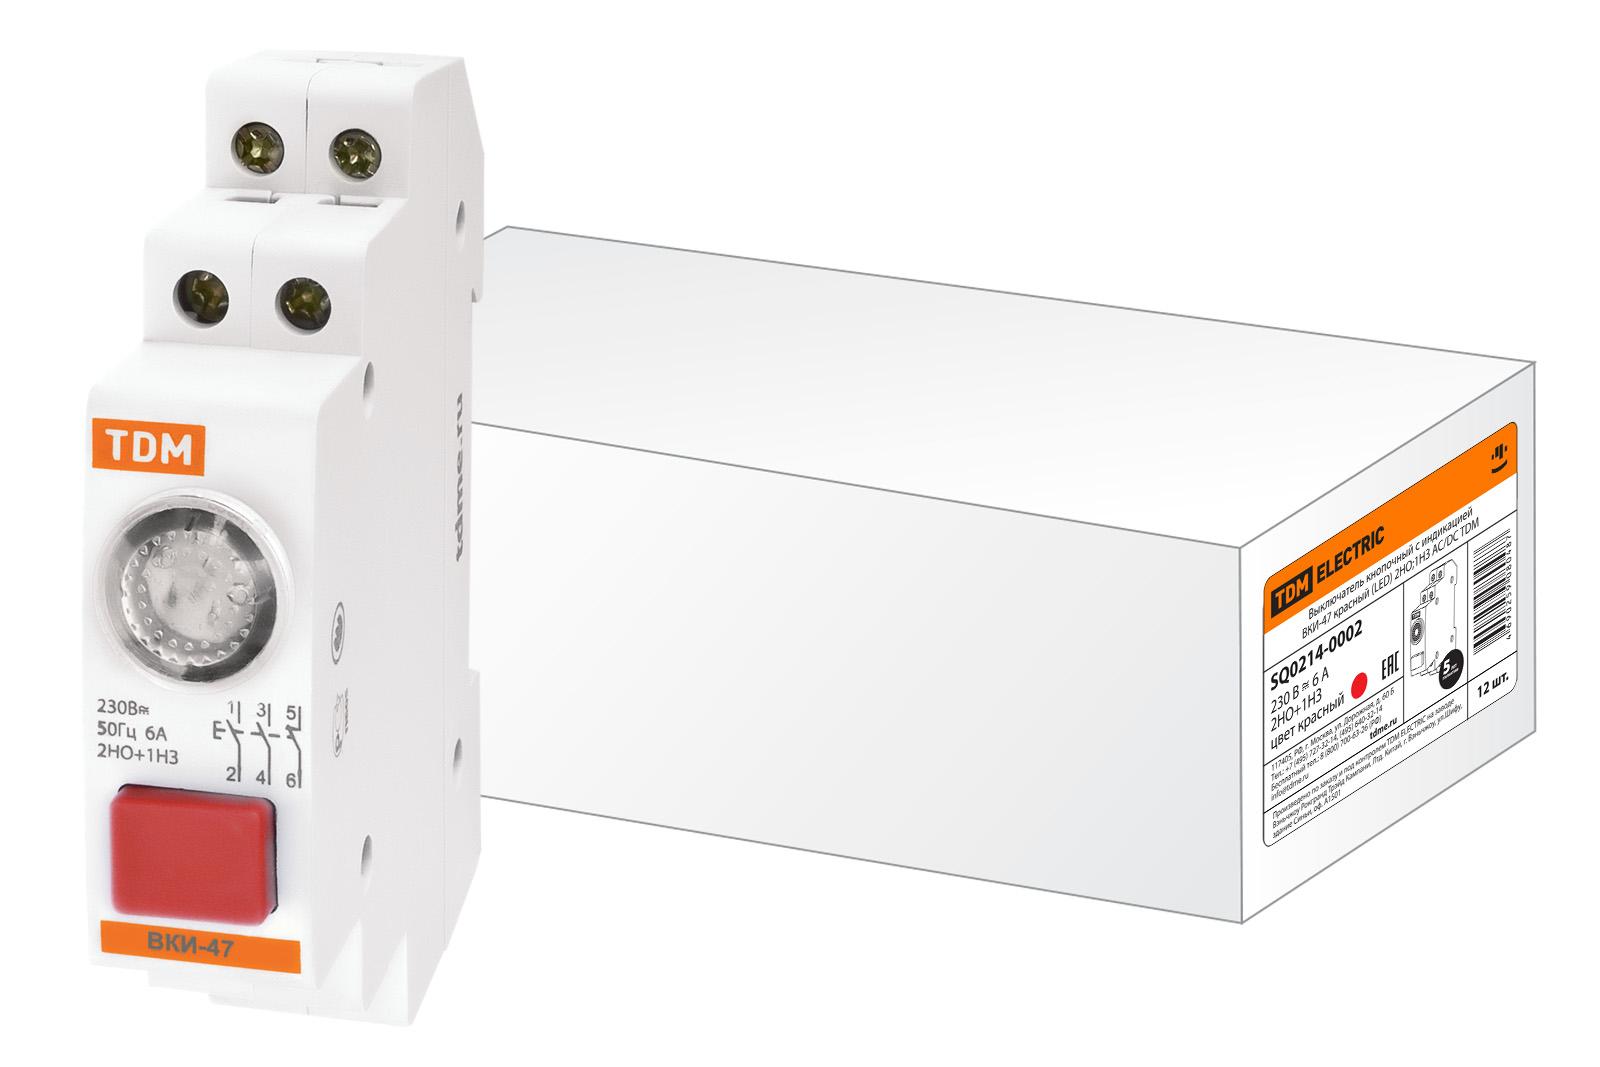 Выключатель Tdm Sq0214-0002 сигнальная лампа зеленая tdm лс 47 led ac dc sq0214 0009